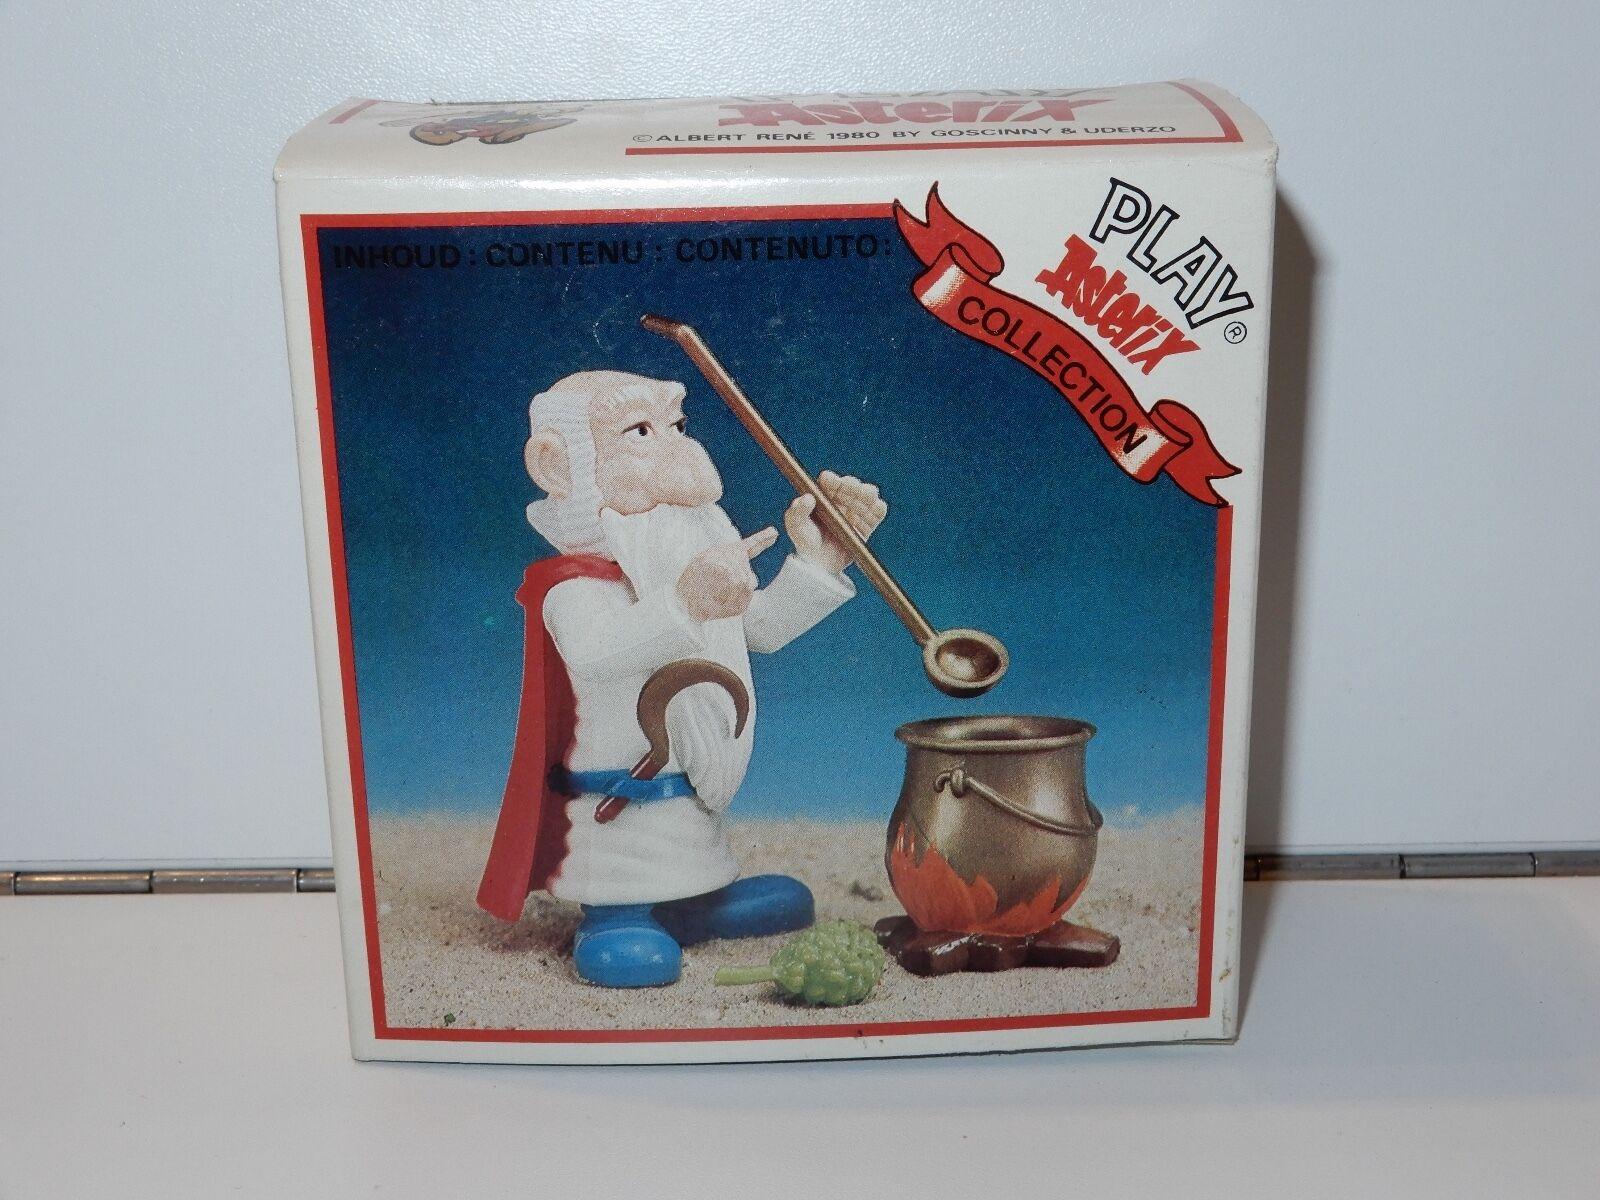 Asterix spielen oder action - figuren miraculix mib versiegelt inhalt toycloud 80er